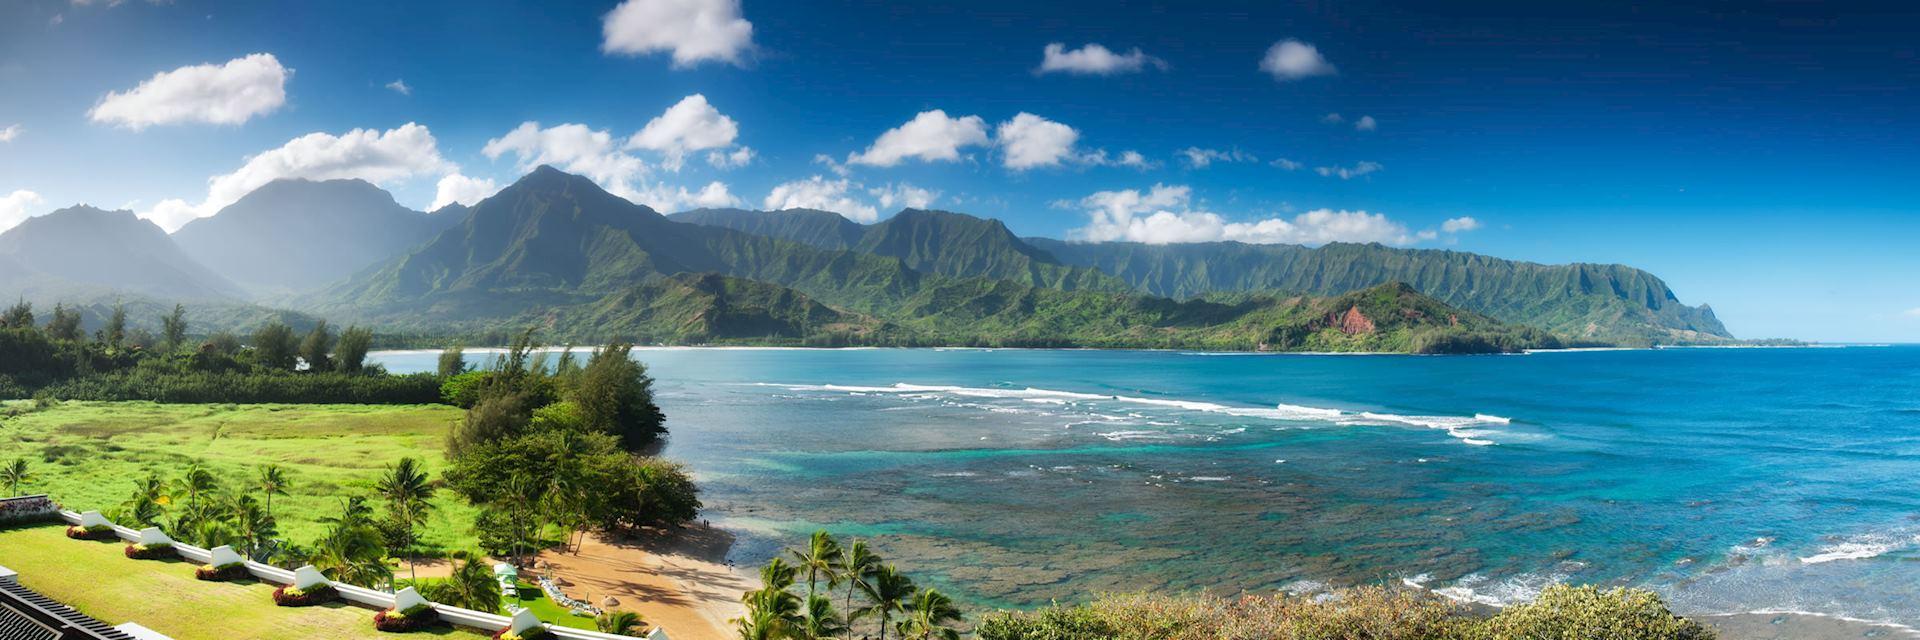 Hanalei_Bay, Kauai